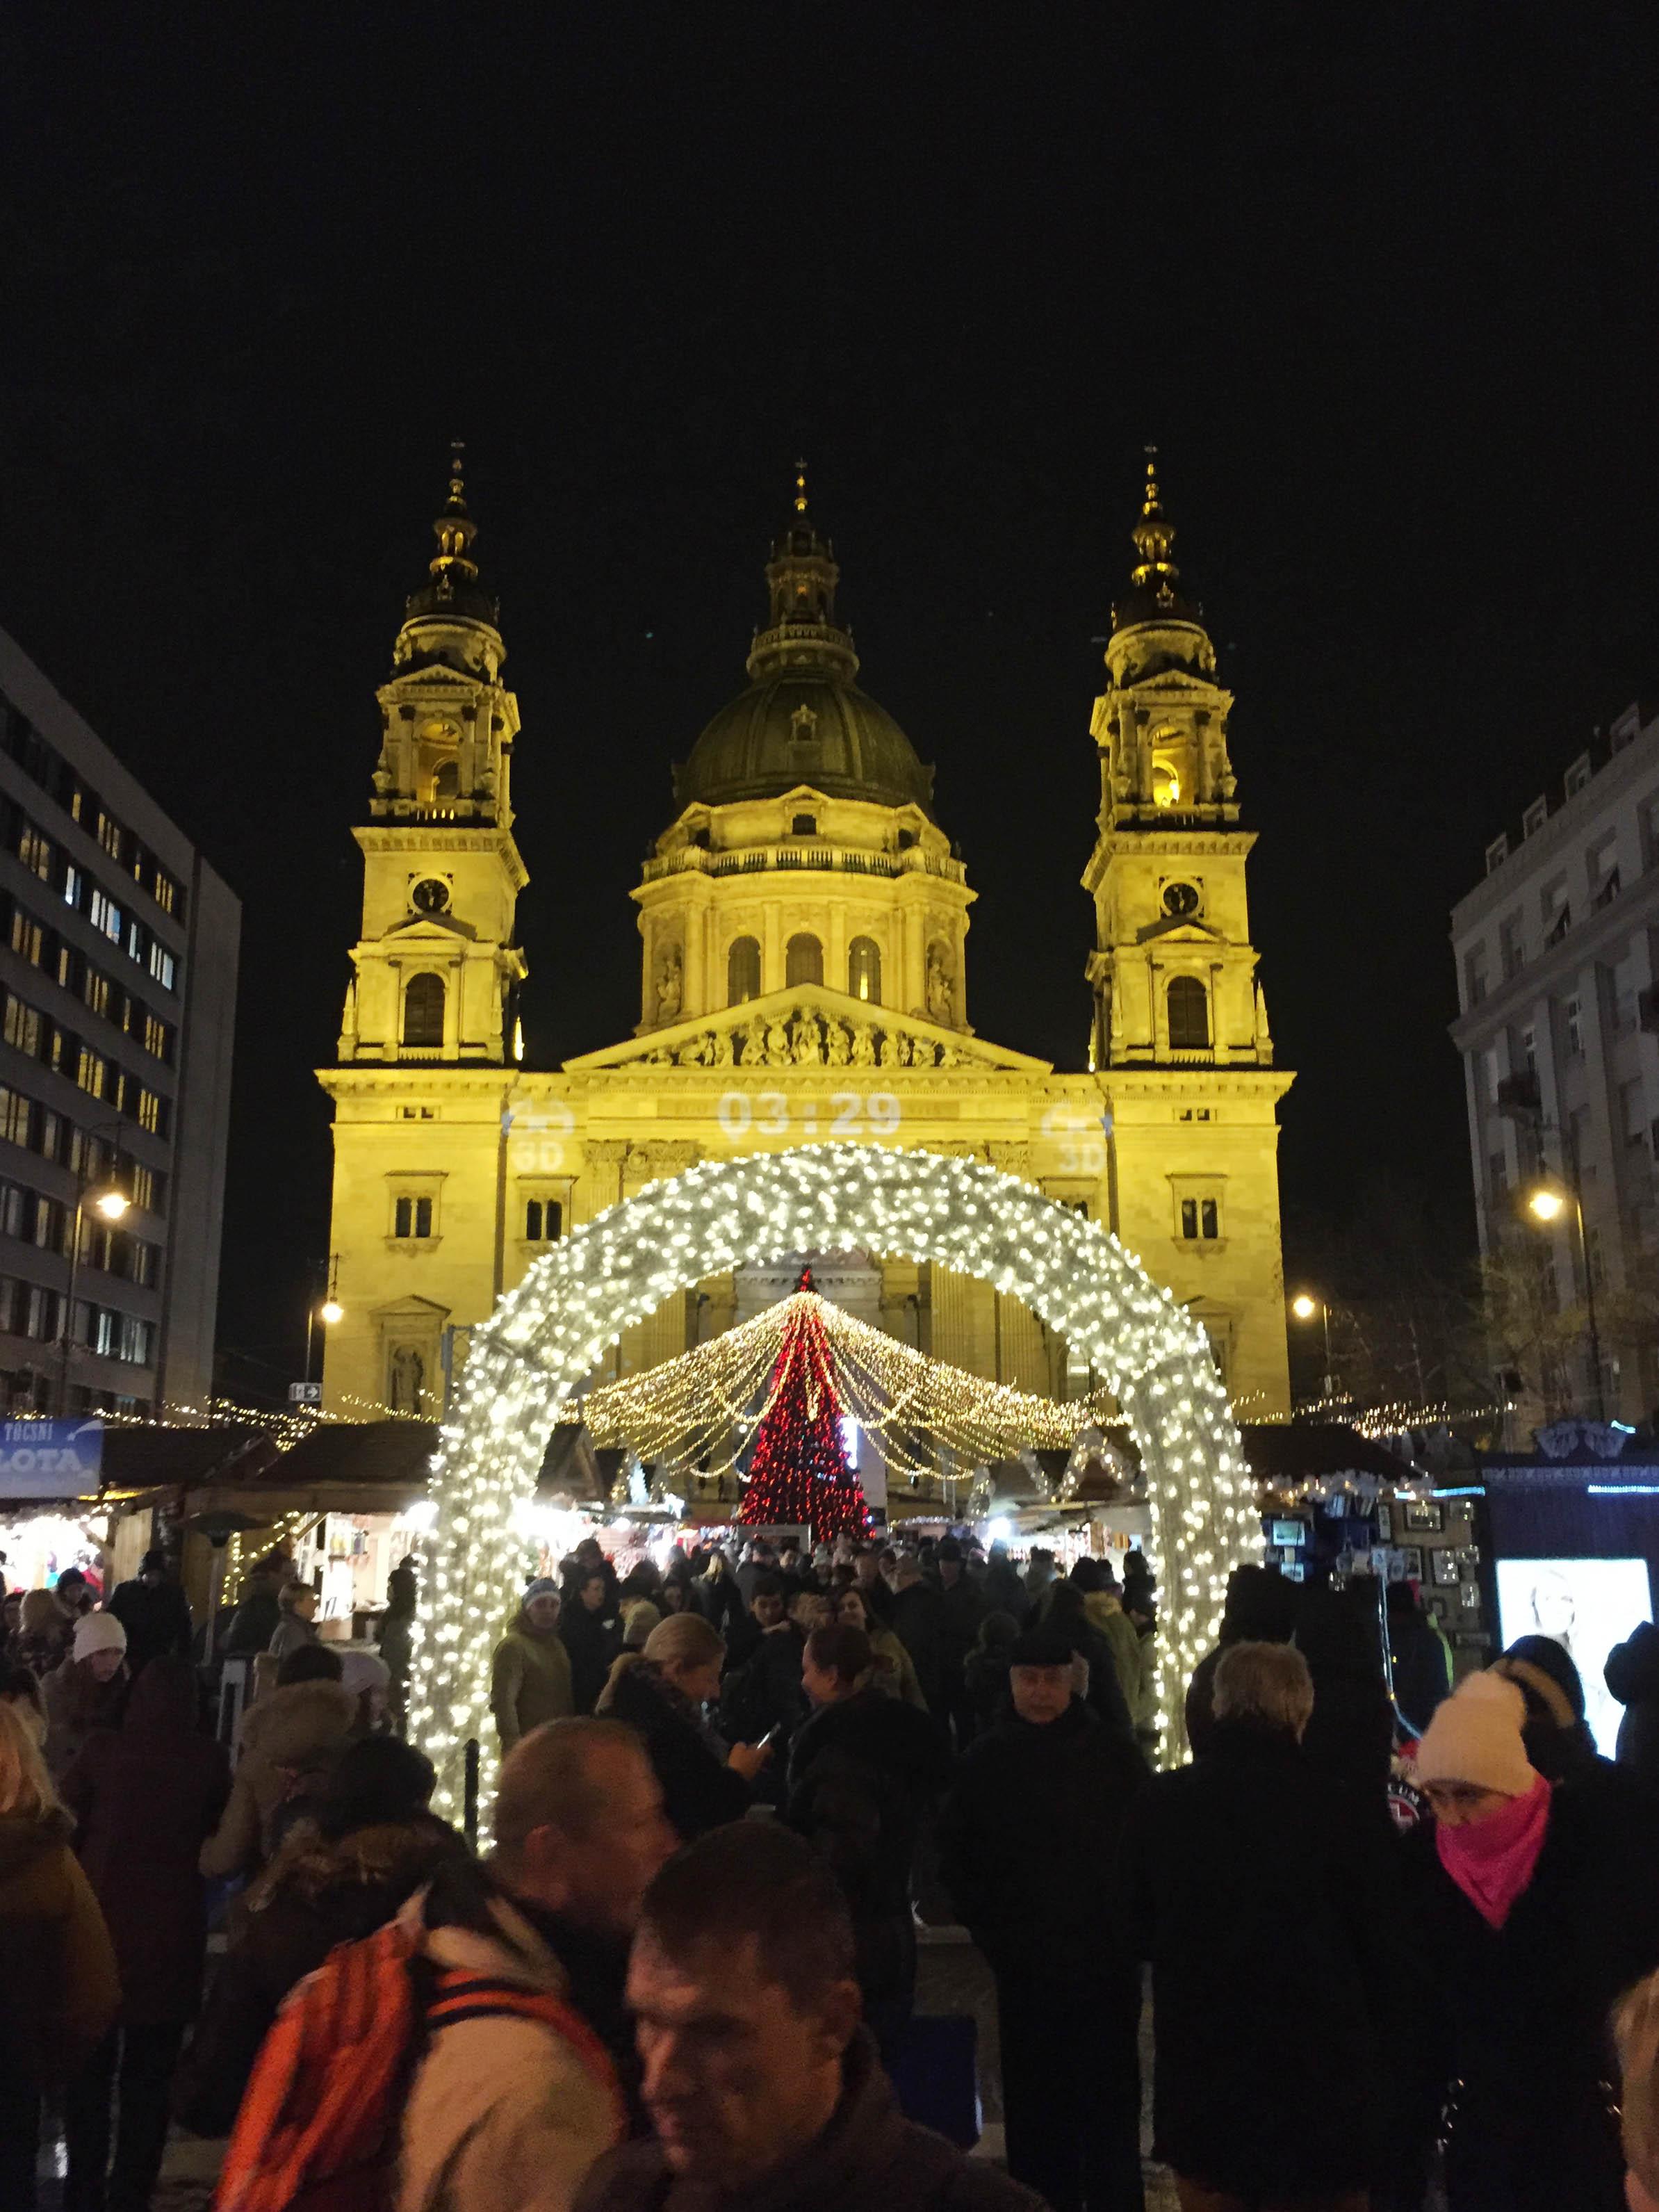 St. Stephen's Basilica Christmas Markets Budapest